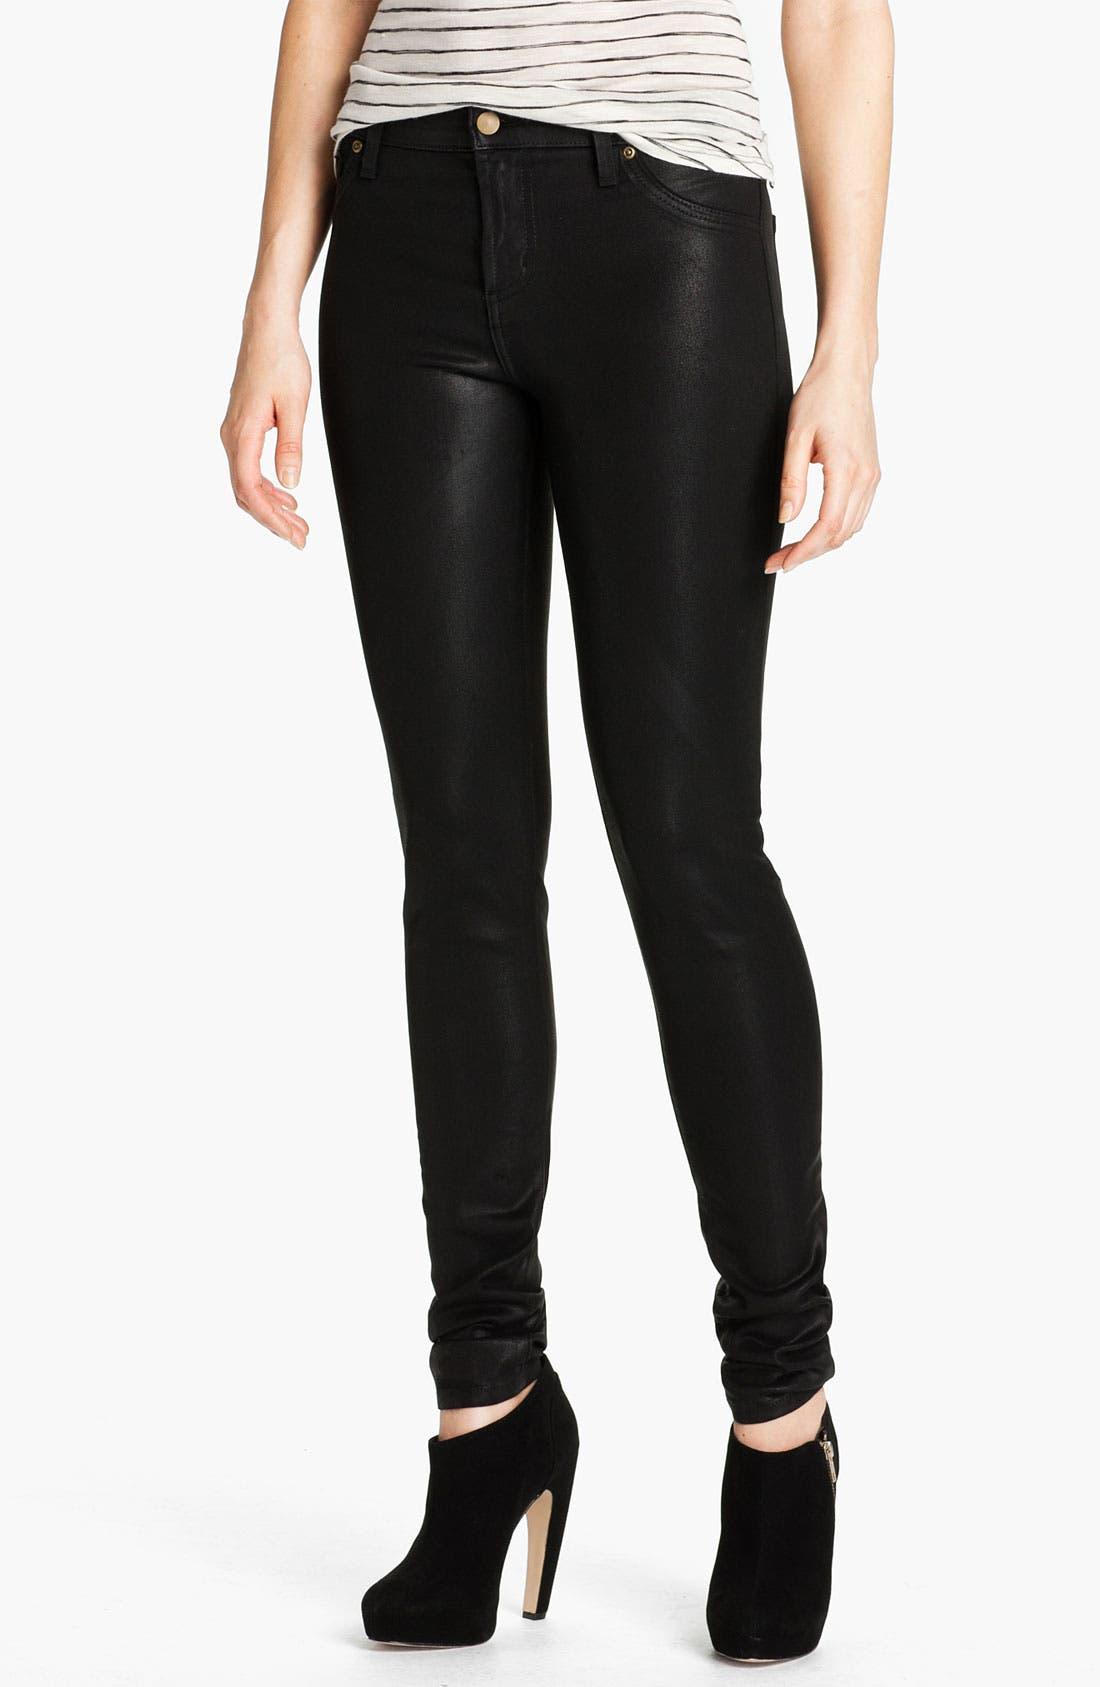 Sarah & George Coated Denim Jeans,                         Main,                         color, 001